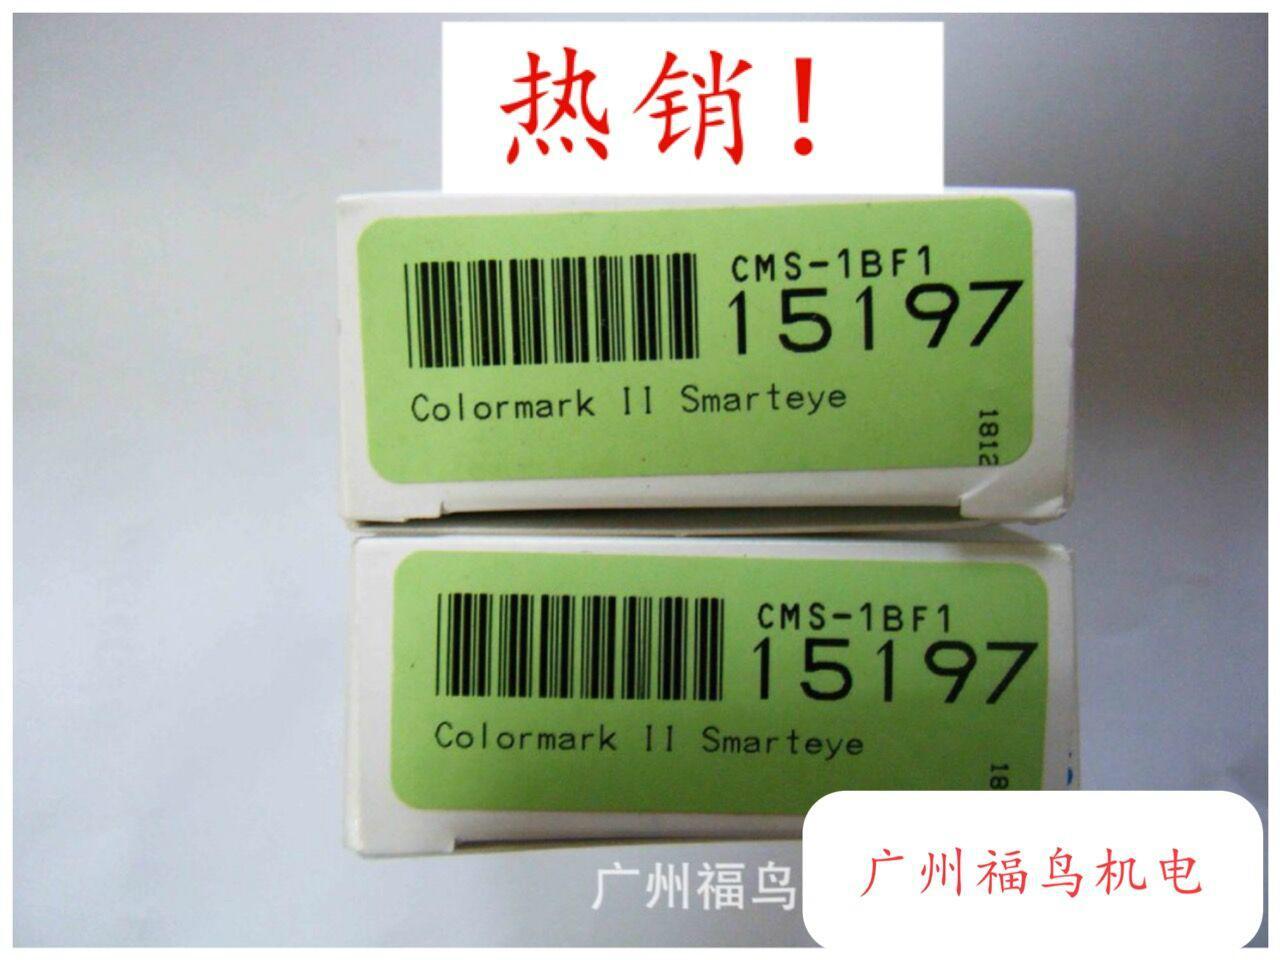 TRI-TRONICS傳感器, 型號: CMS-1BF1